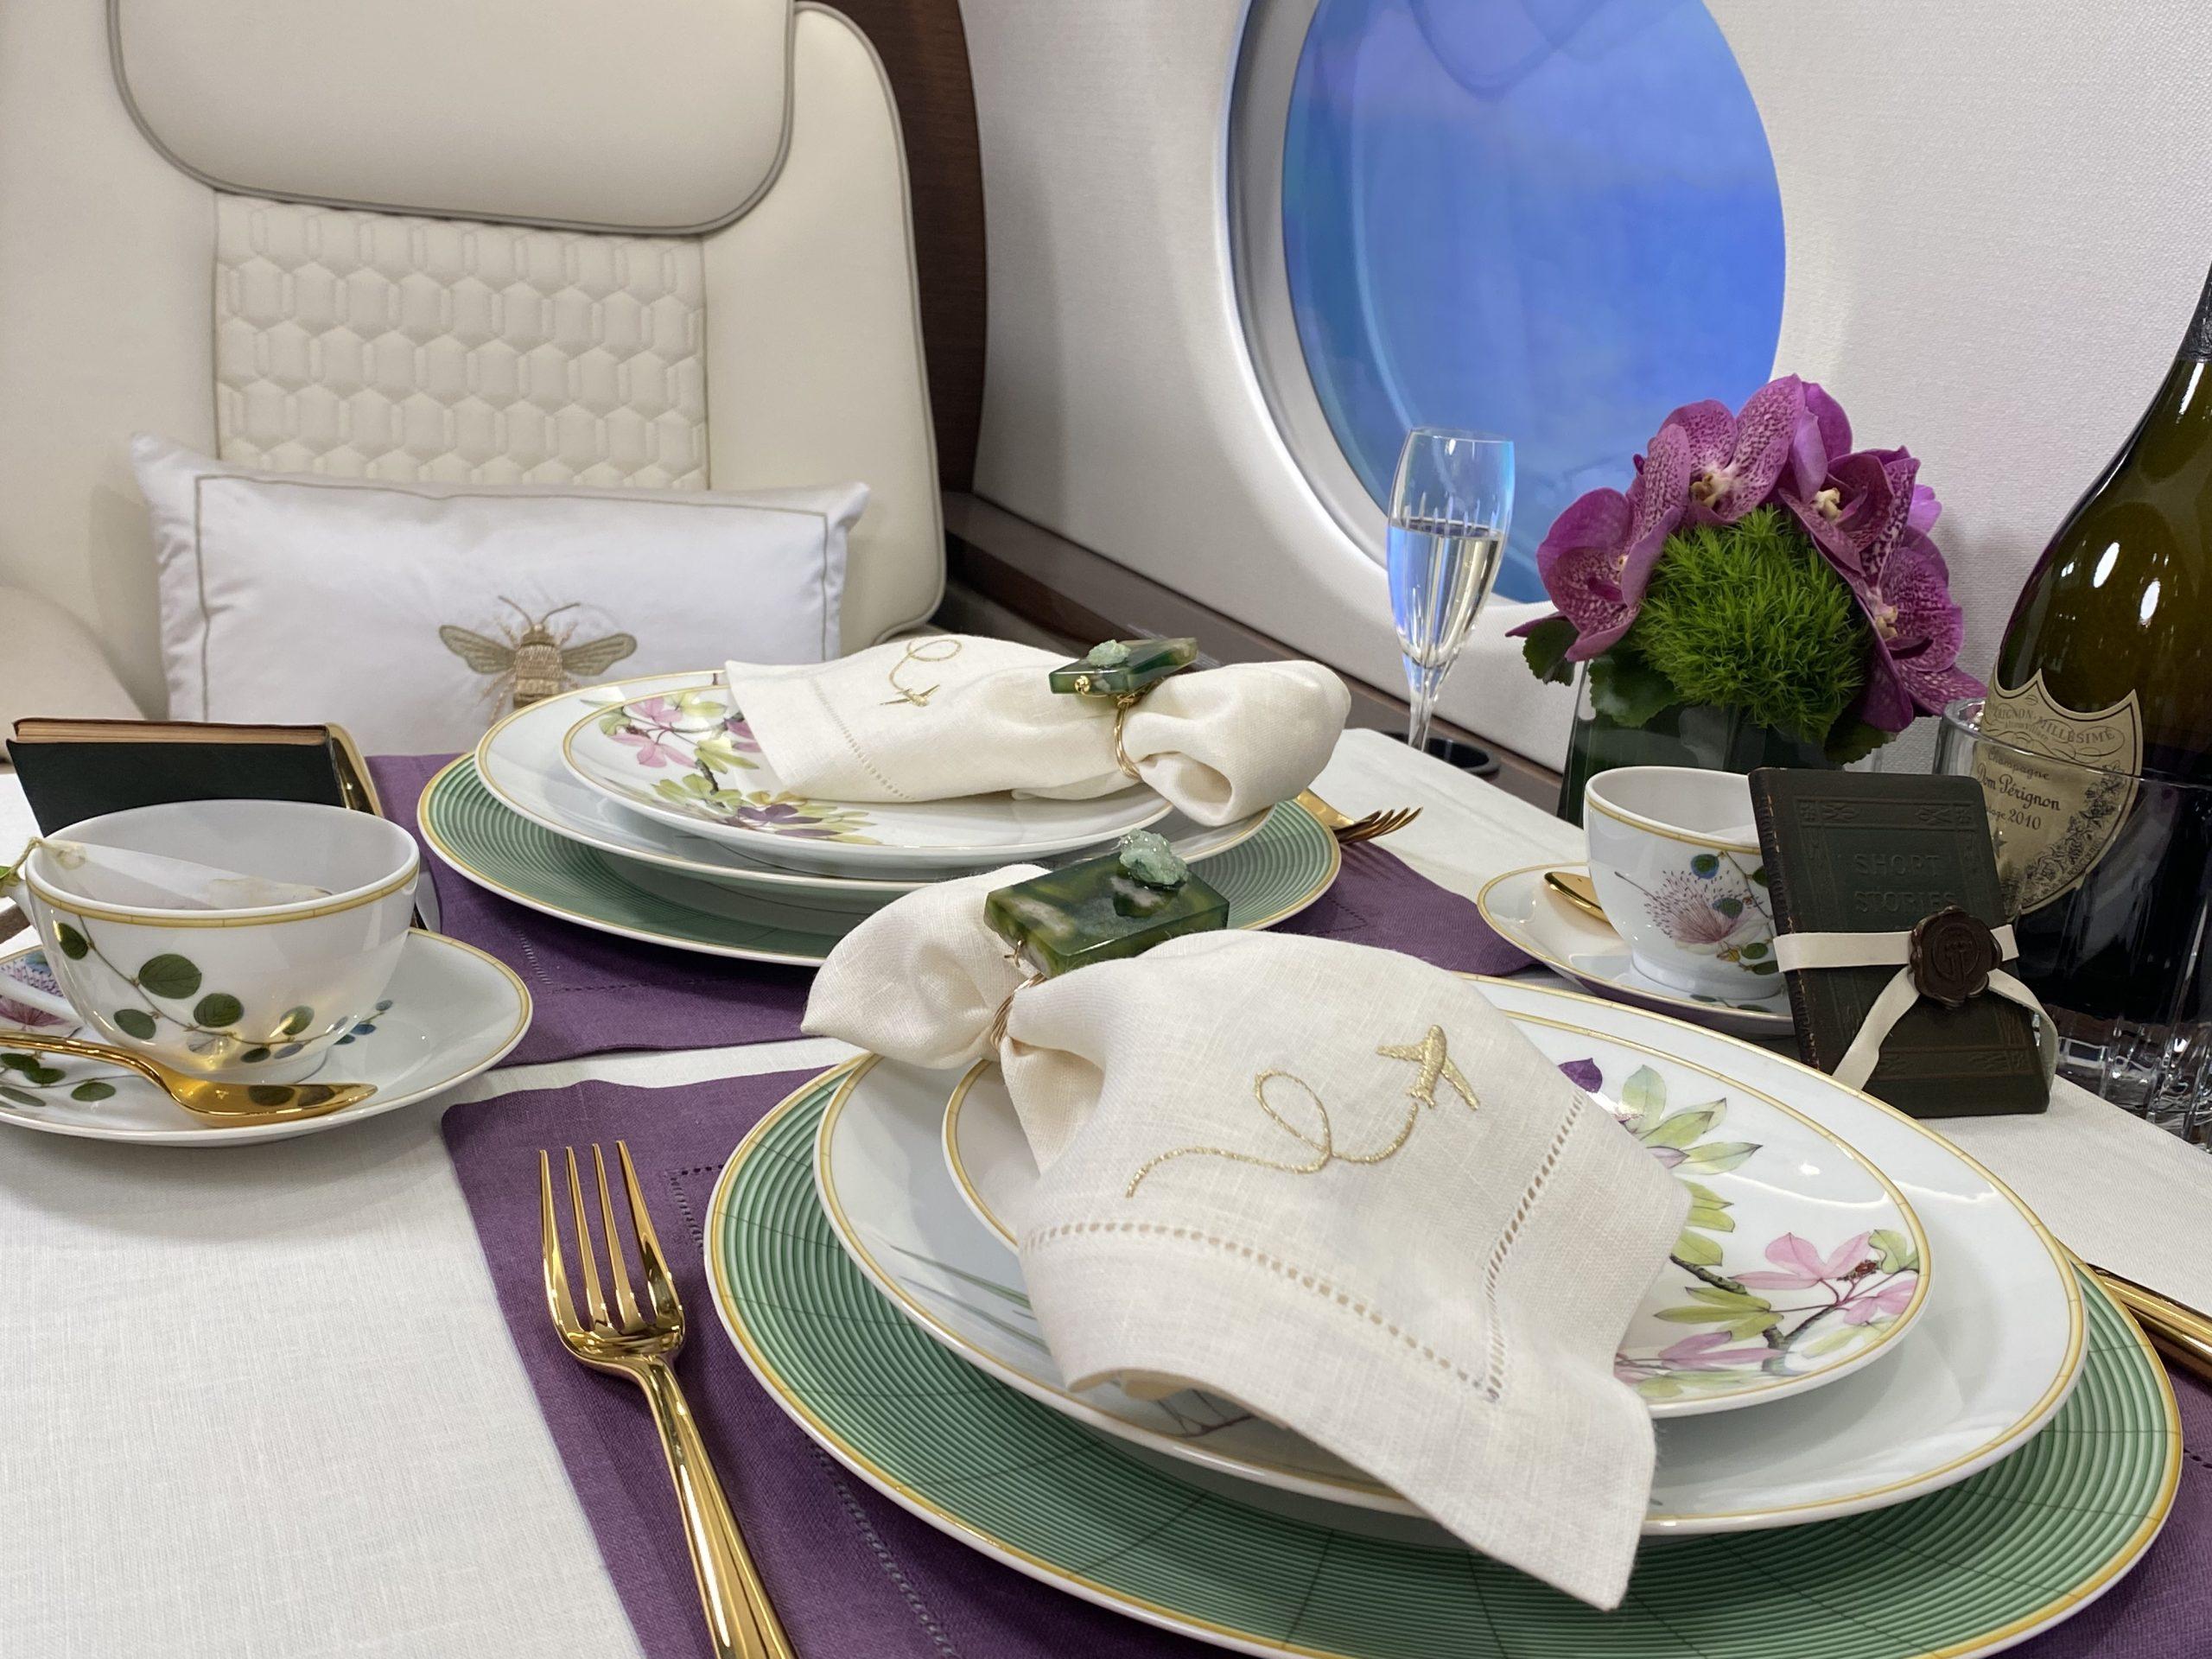 International Jet Interiors X SFERRA Summer Soiree at 40,000 Feet